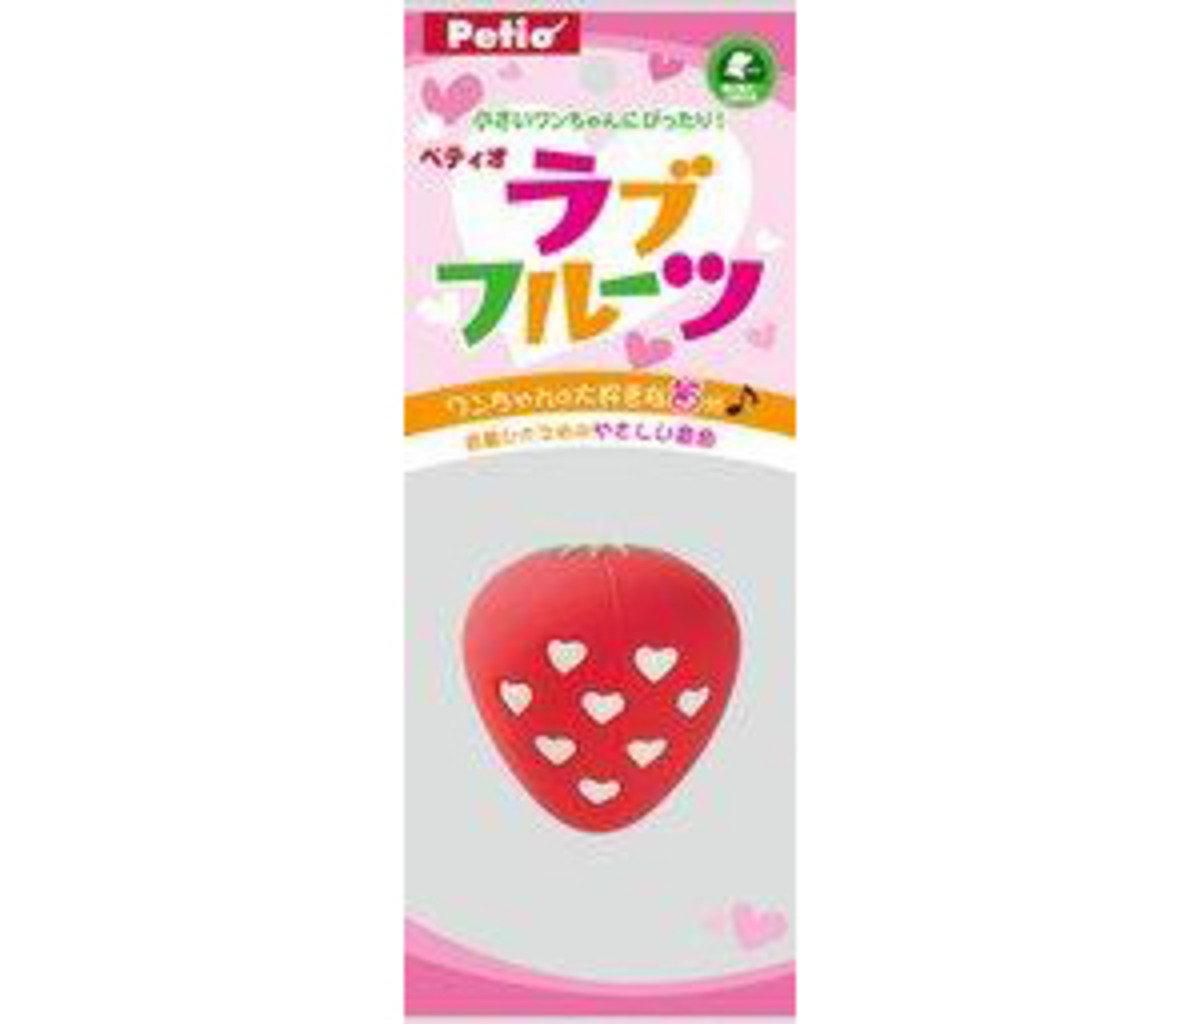 PO23588 日本 PETIO 發聲玩具 - 士多啤梨